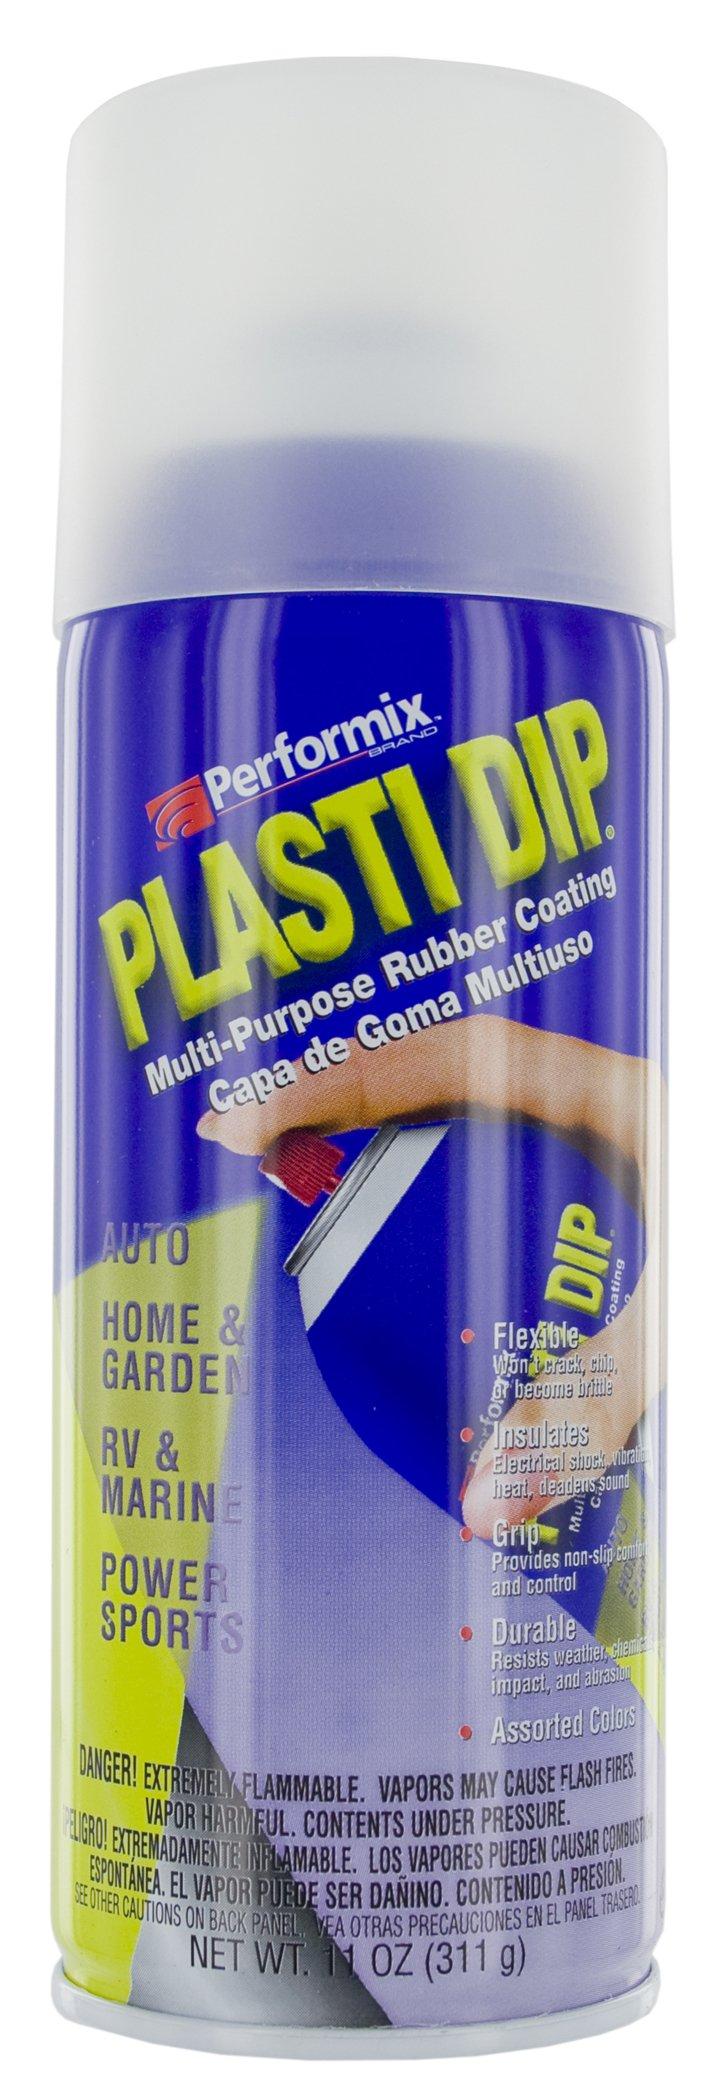 Plasti Dip Performix 11209 Clear Multi-Purpose Rubber Coating Aerosol - 11 oz.